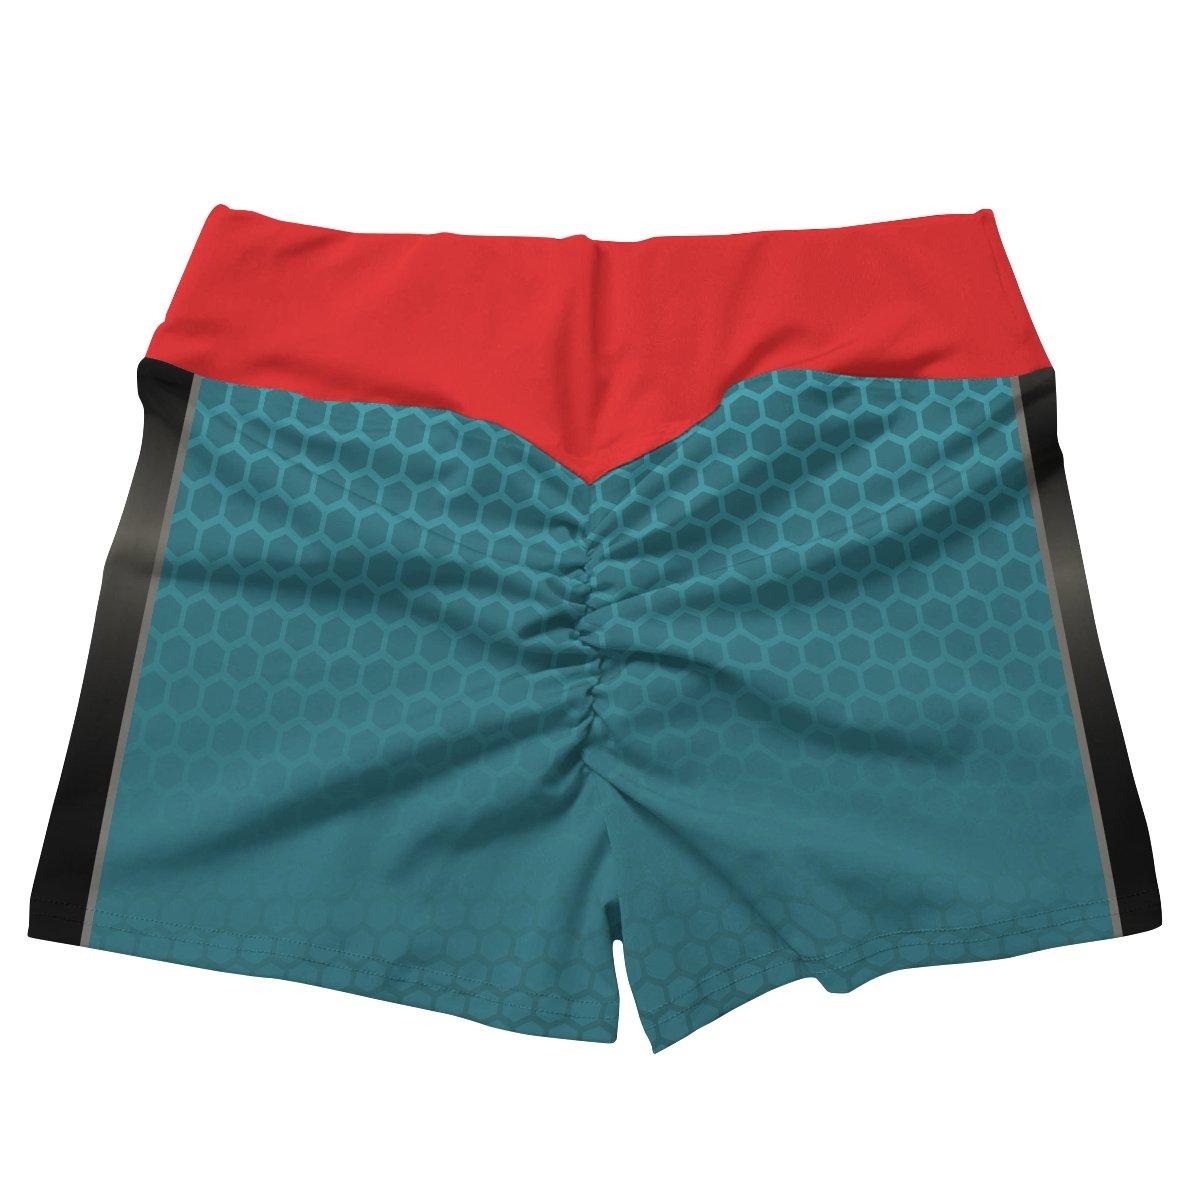 ua high izuku active wear set 590822 - Anime Swimsuits